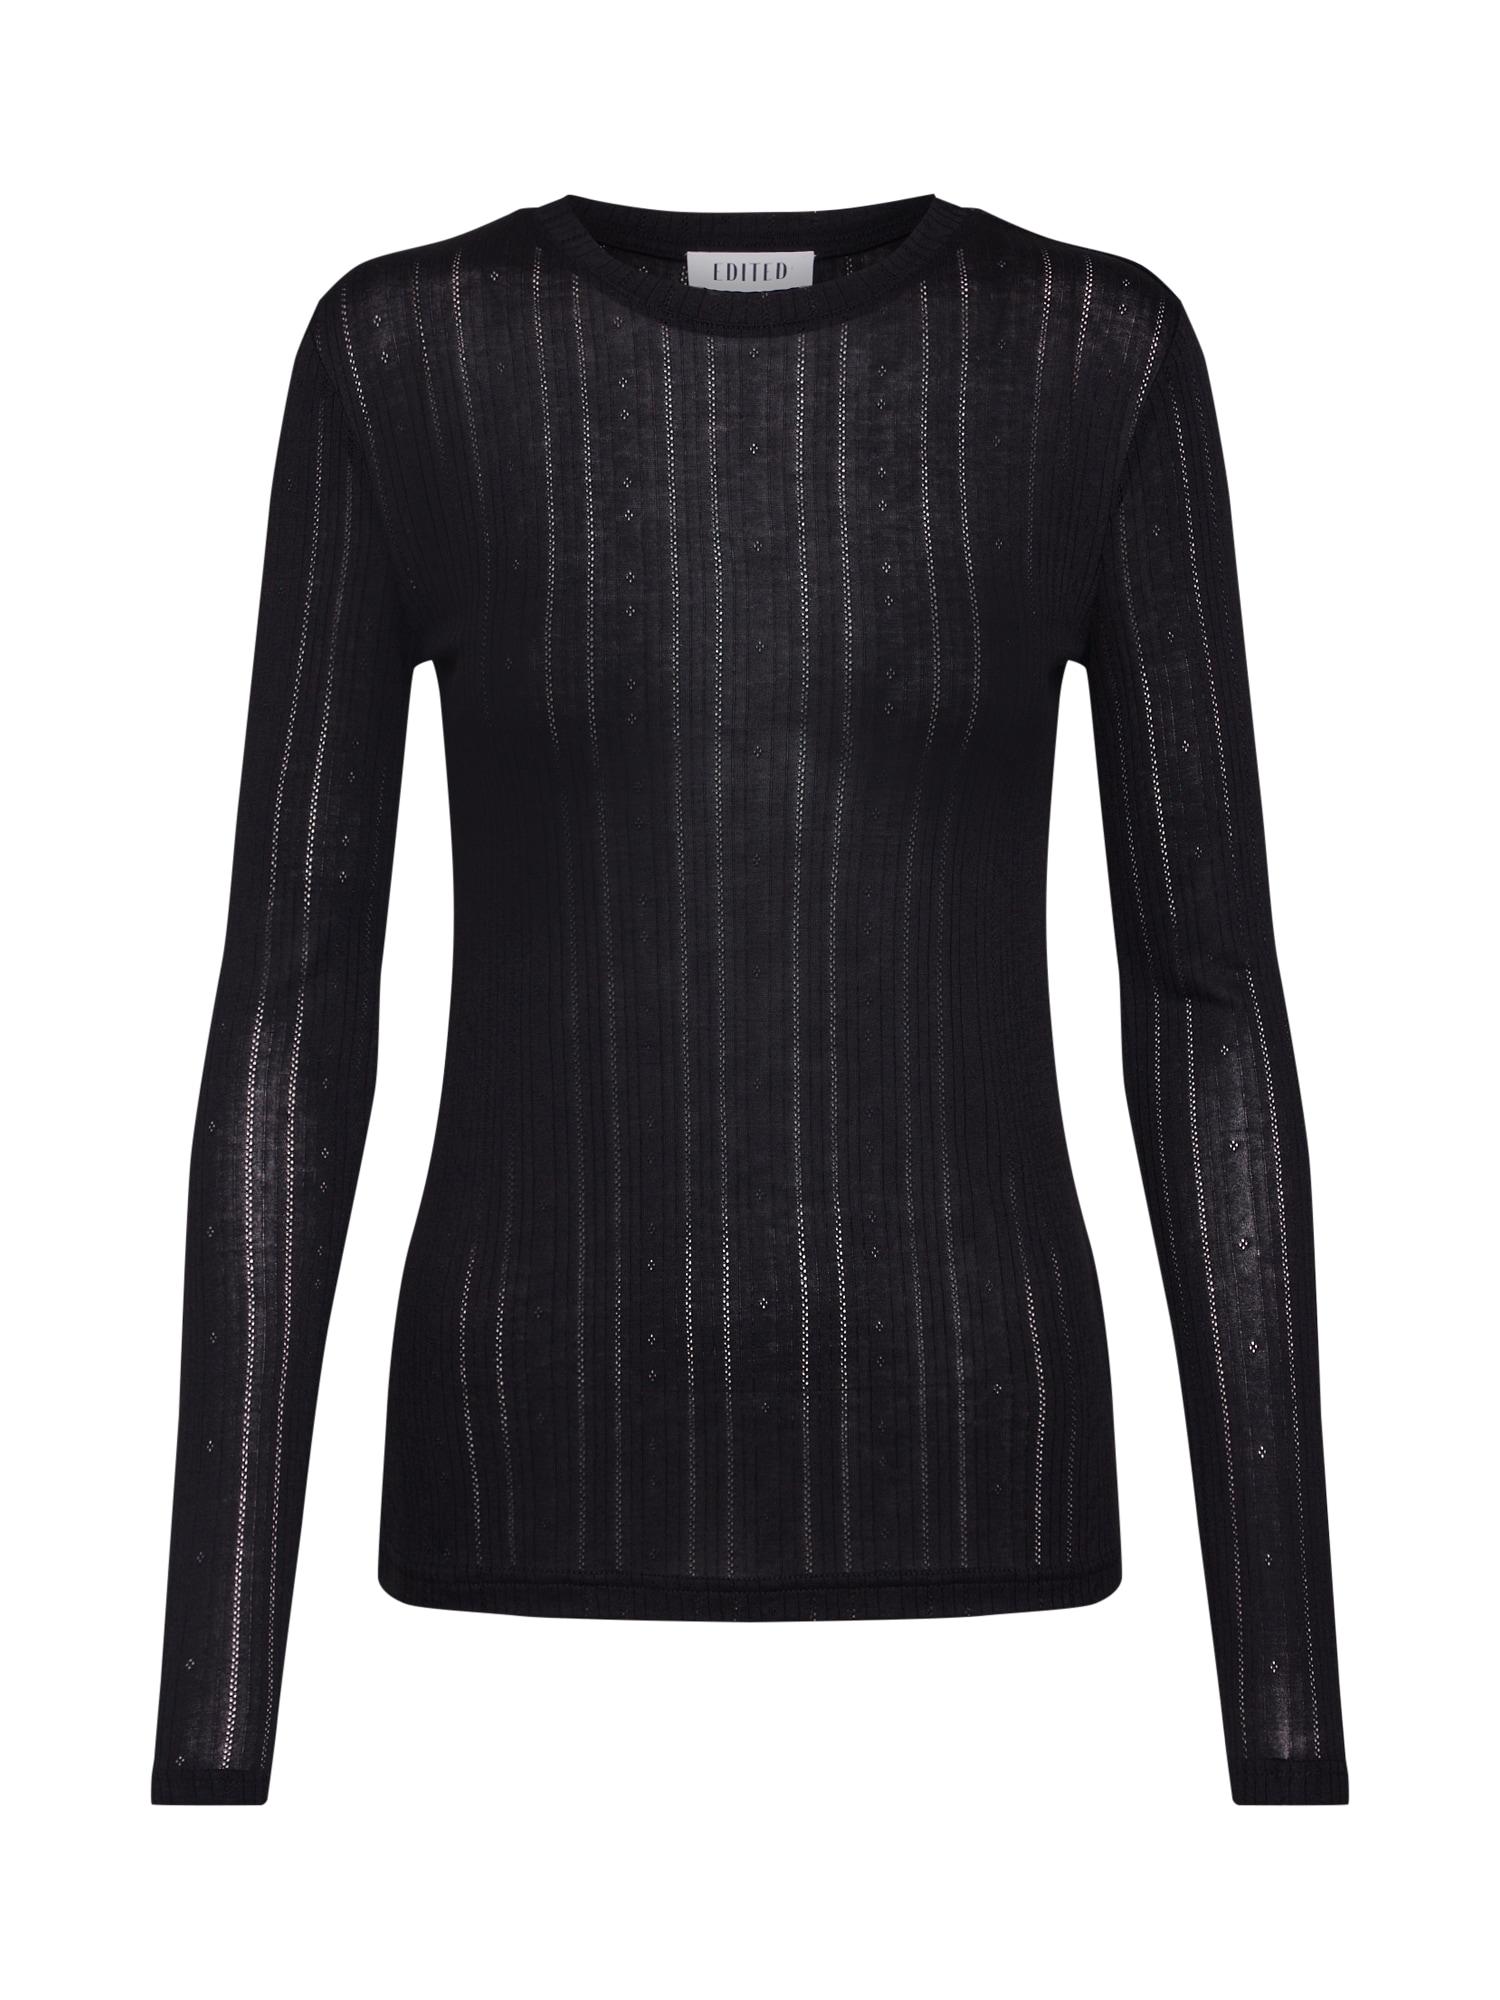 EDITED Marškinėliai 'Katja' juoda